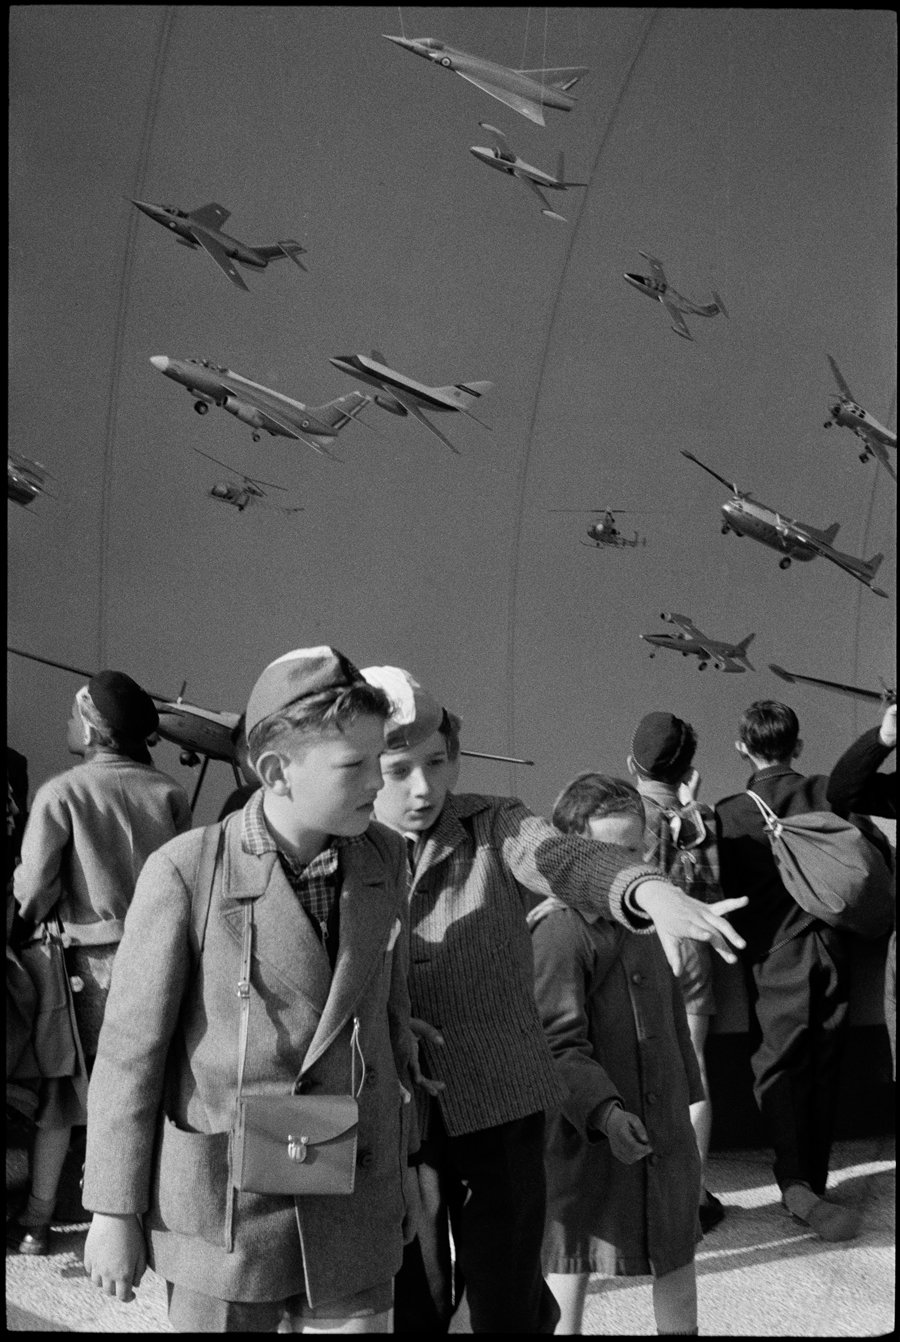 Très Amazon.com: Henri Cartier-Bresson: The Modern Century  BM19